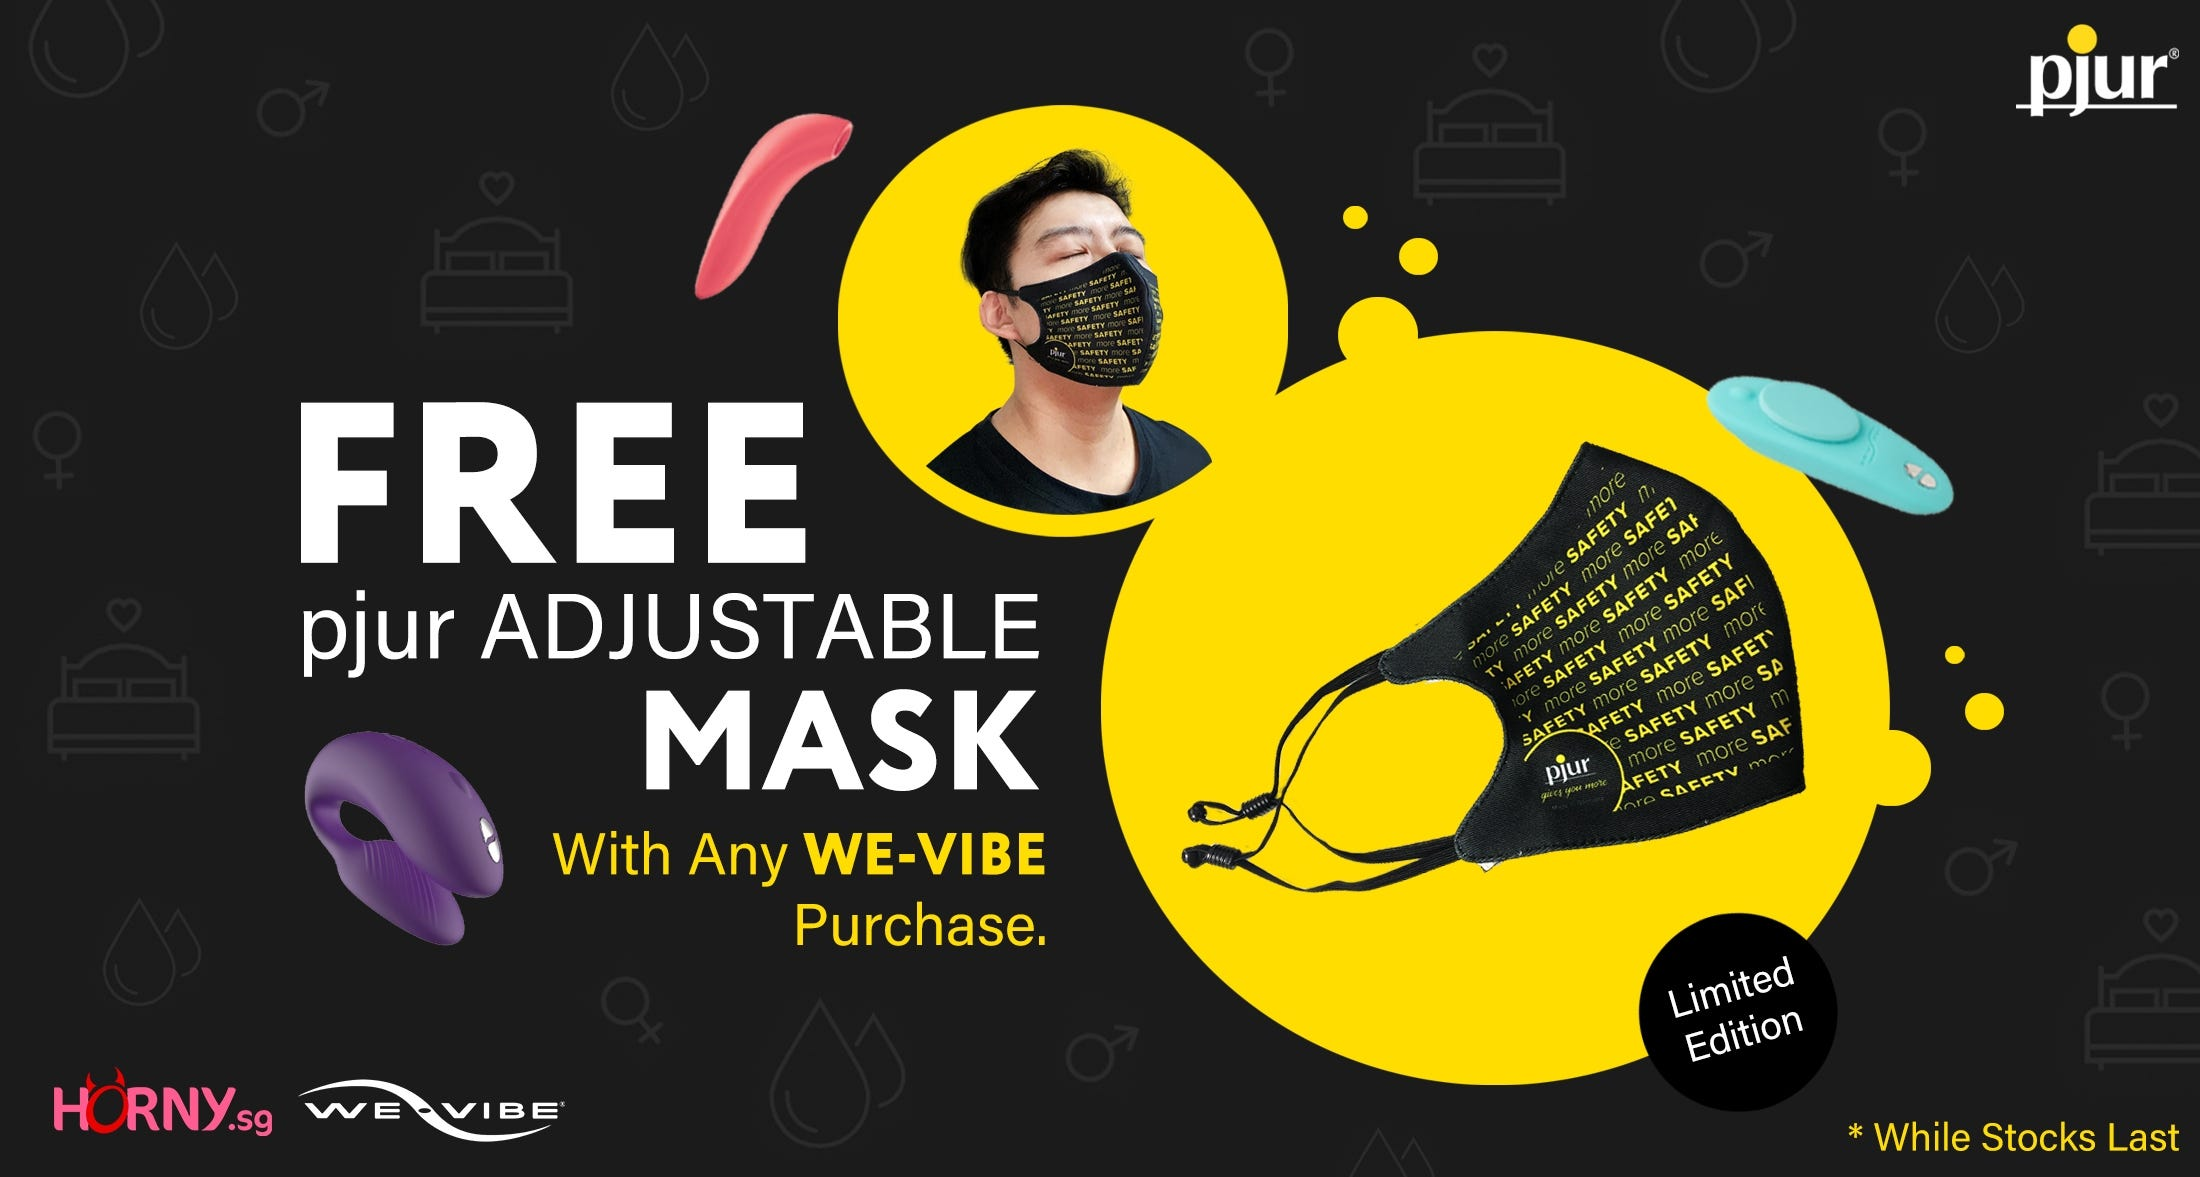 free pjur Mask with We-vibe